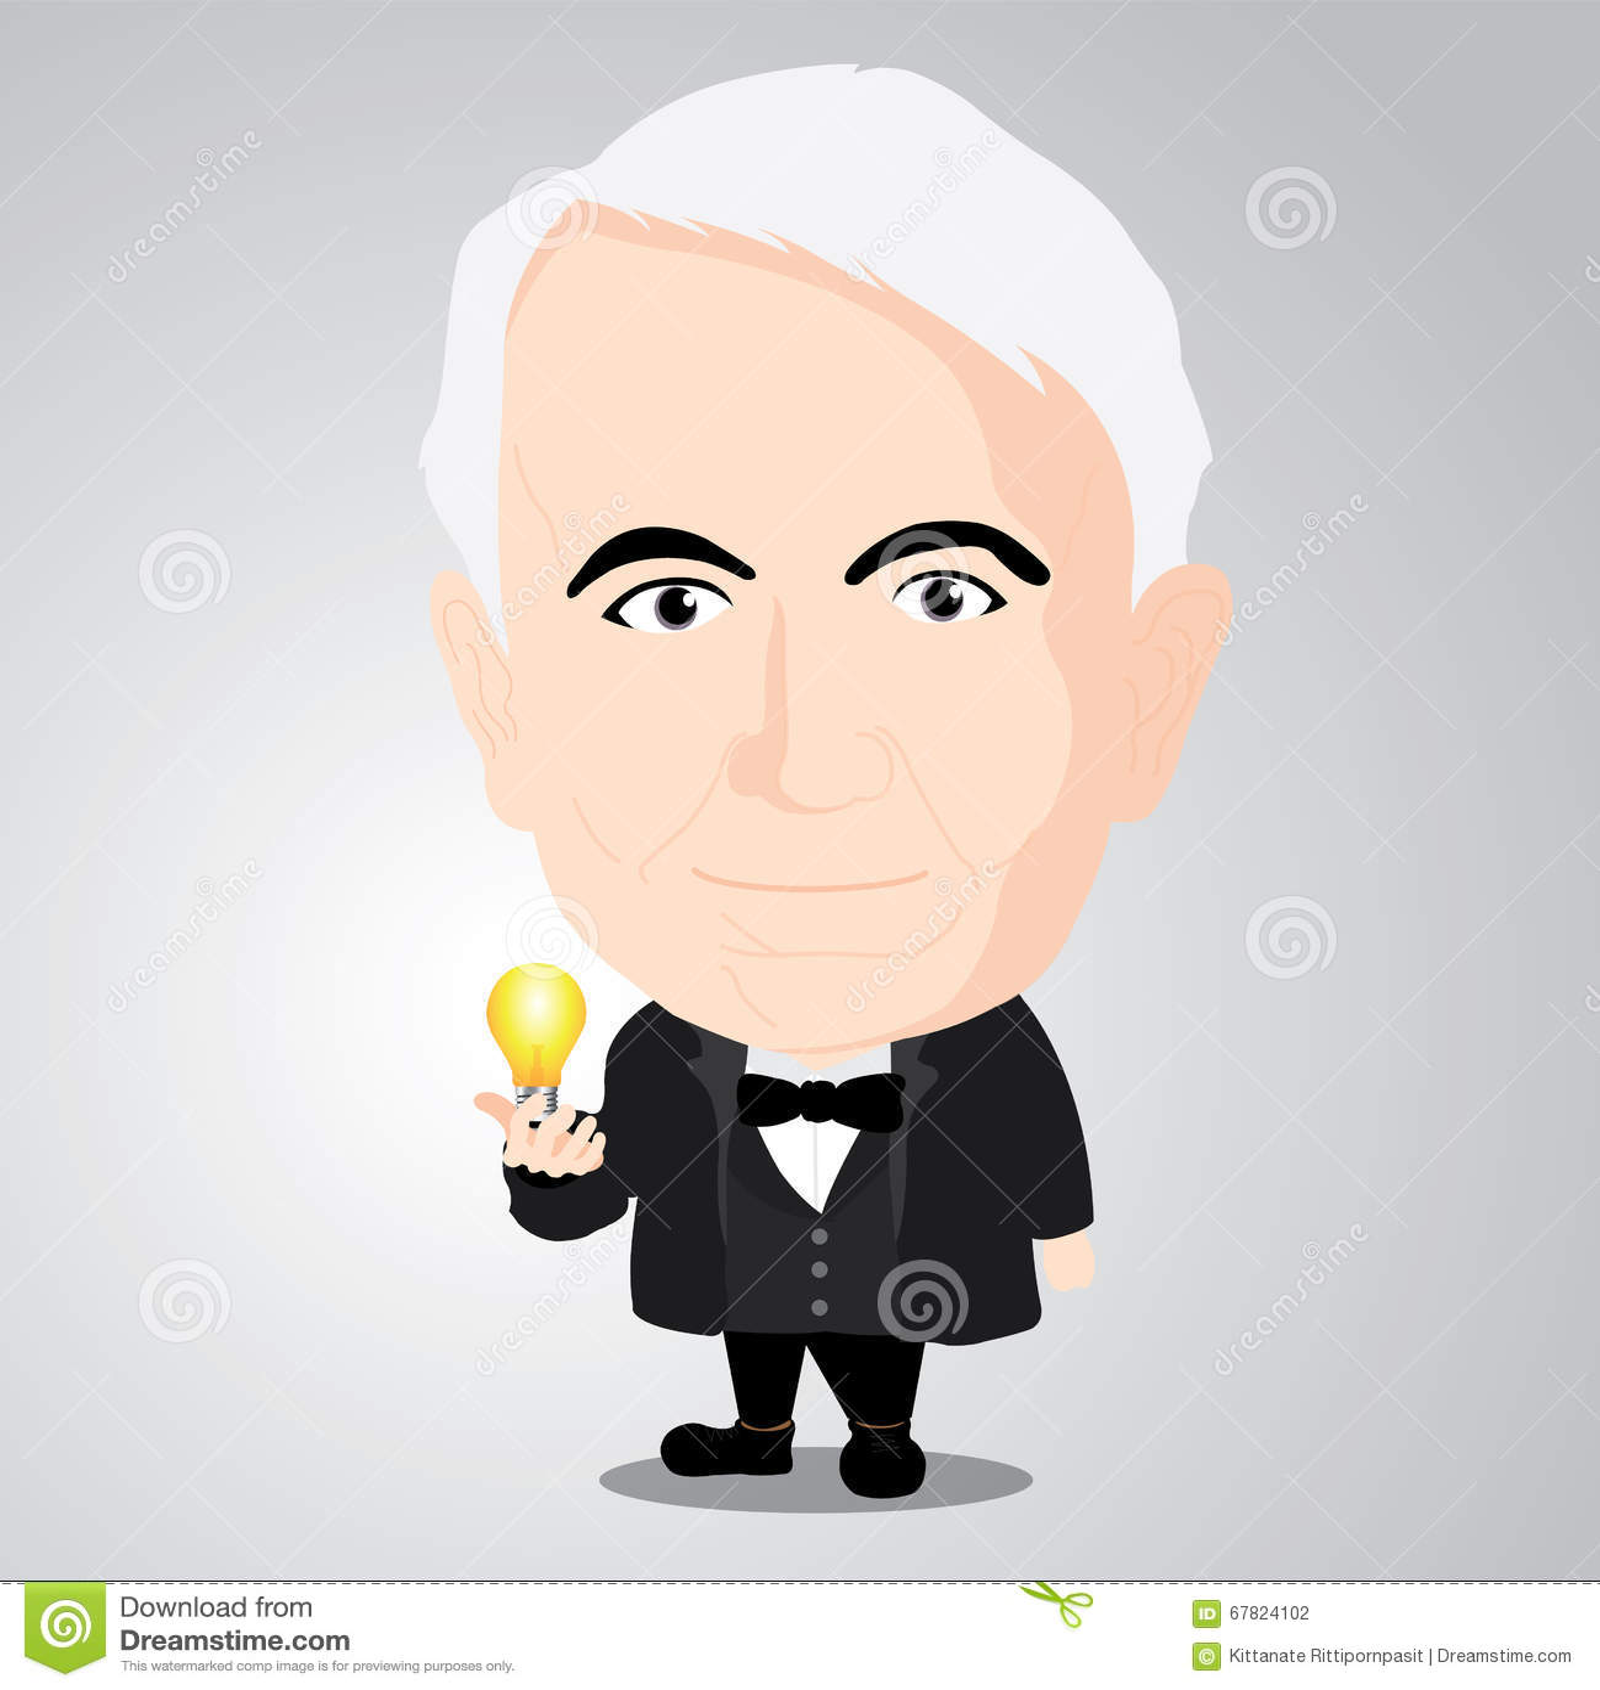 Vector illustration - Thomas Alva Edison